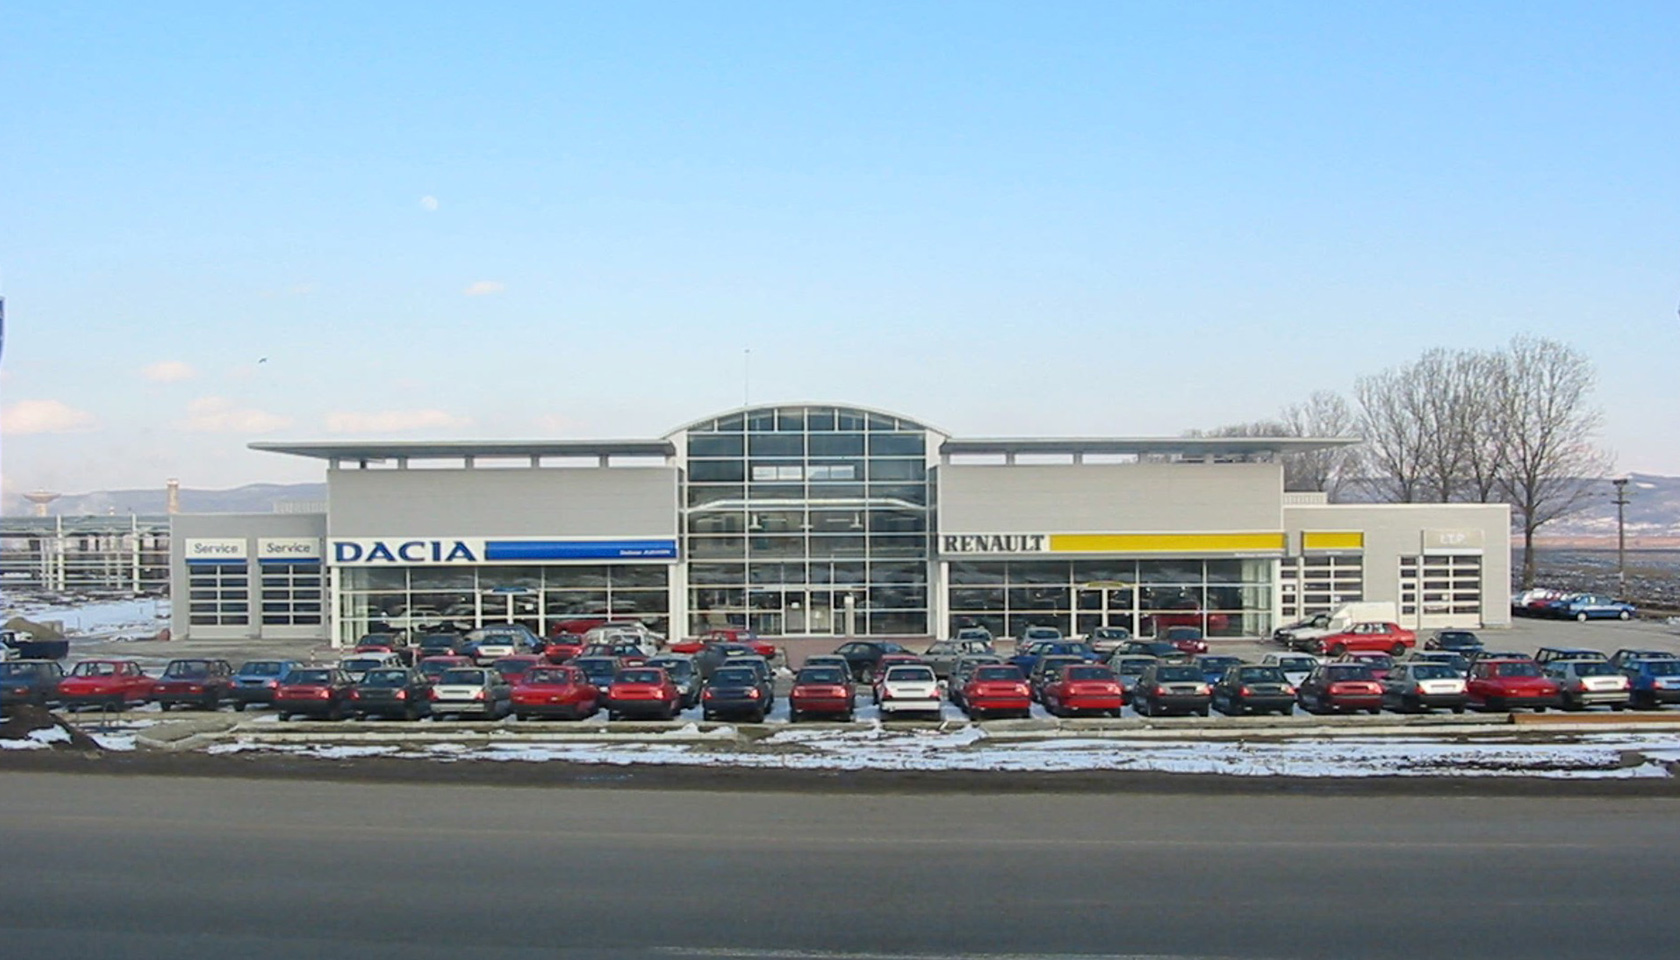 Showroom Dacia Renault Bacau